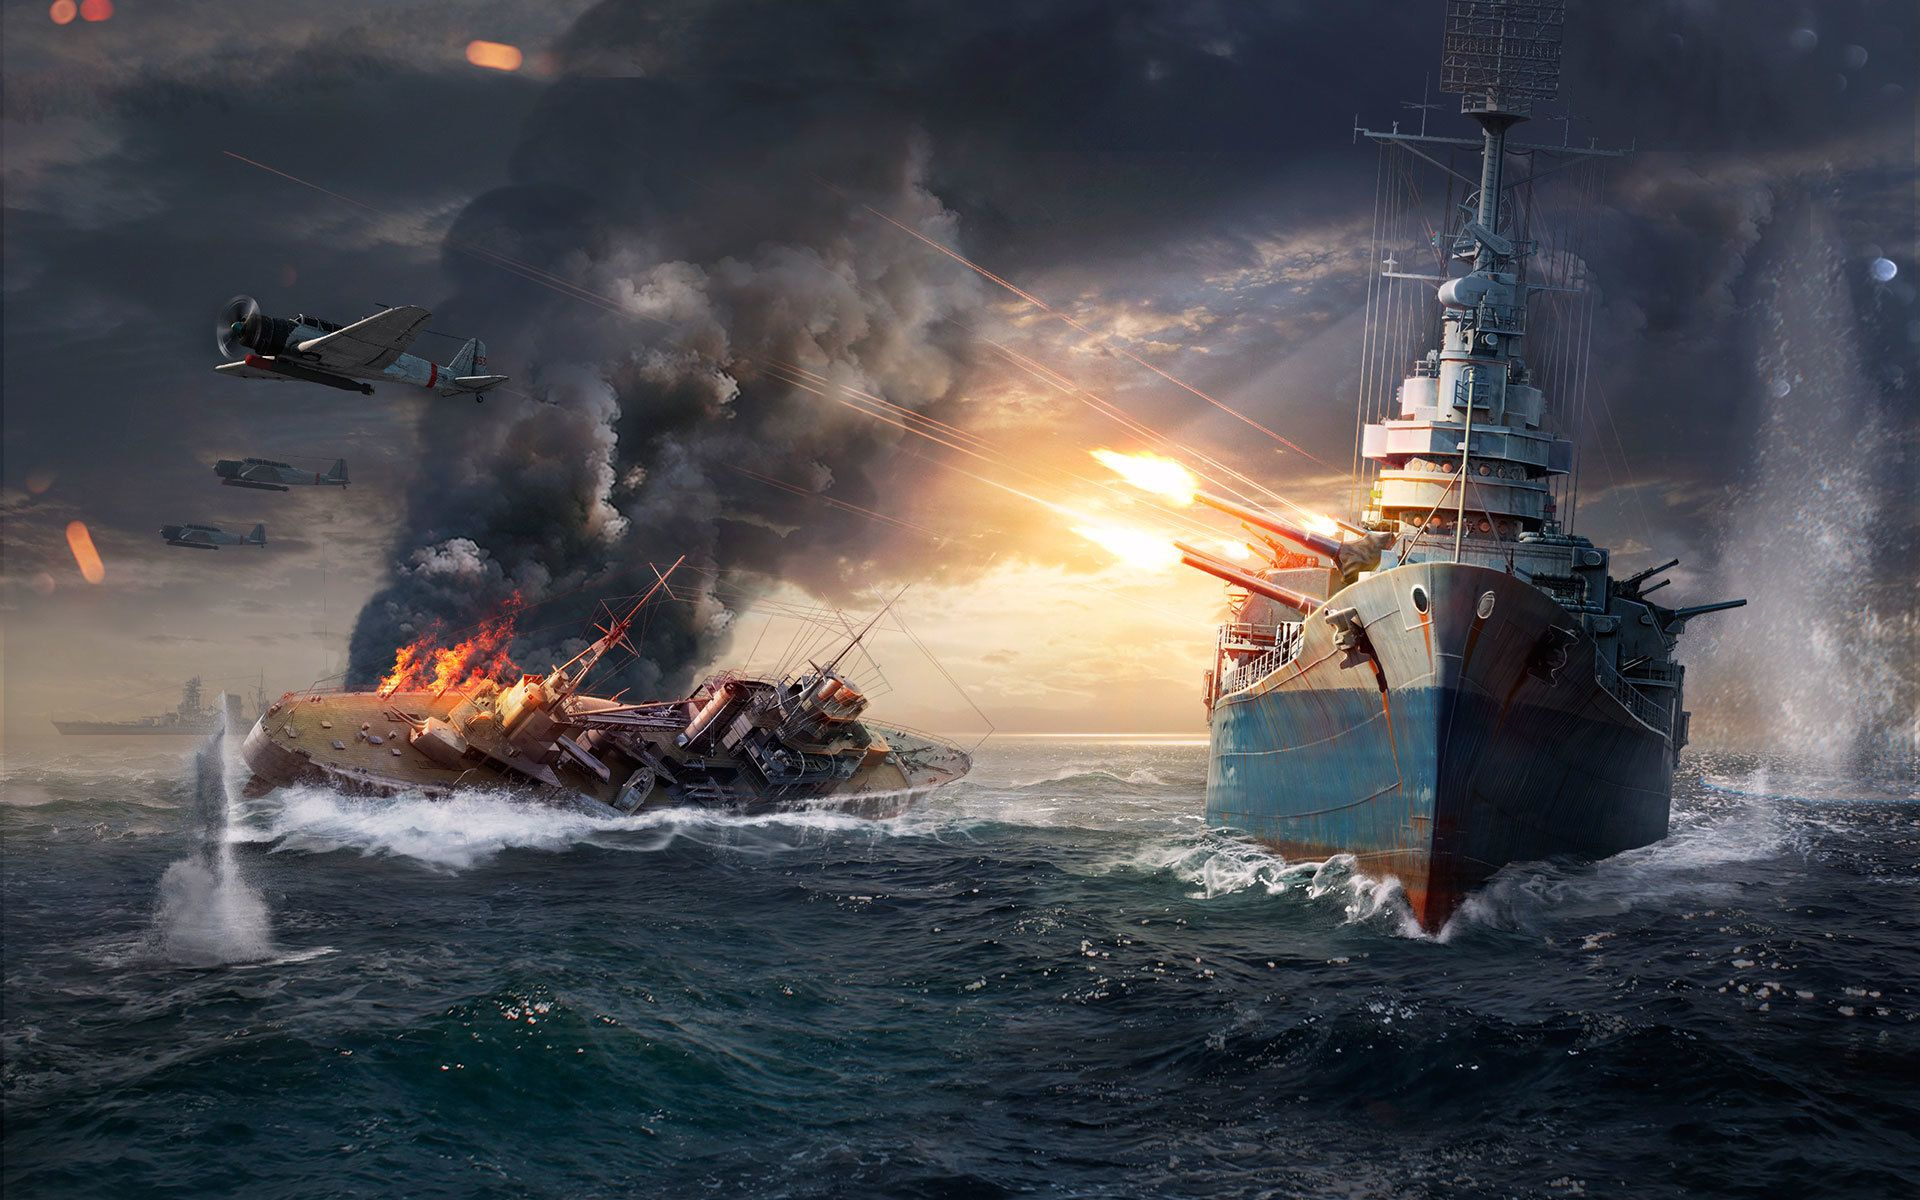 World Of Warships Computer Wallpapers Desktop Backgrounds 1920x1200 Id 652232 World Of Warships Wallpaper Warship Battle Warship